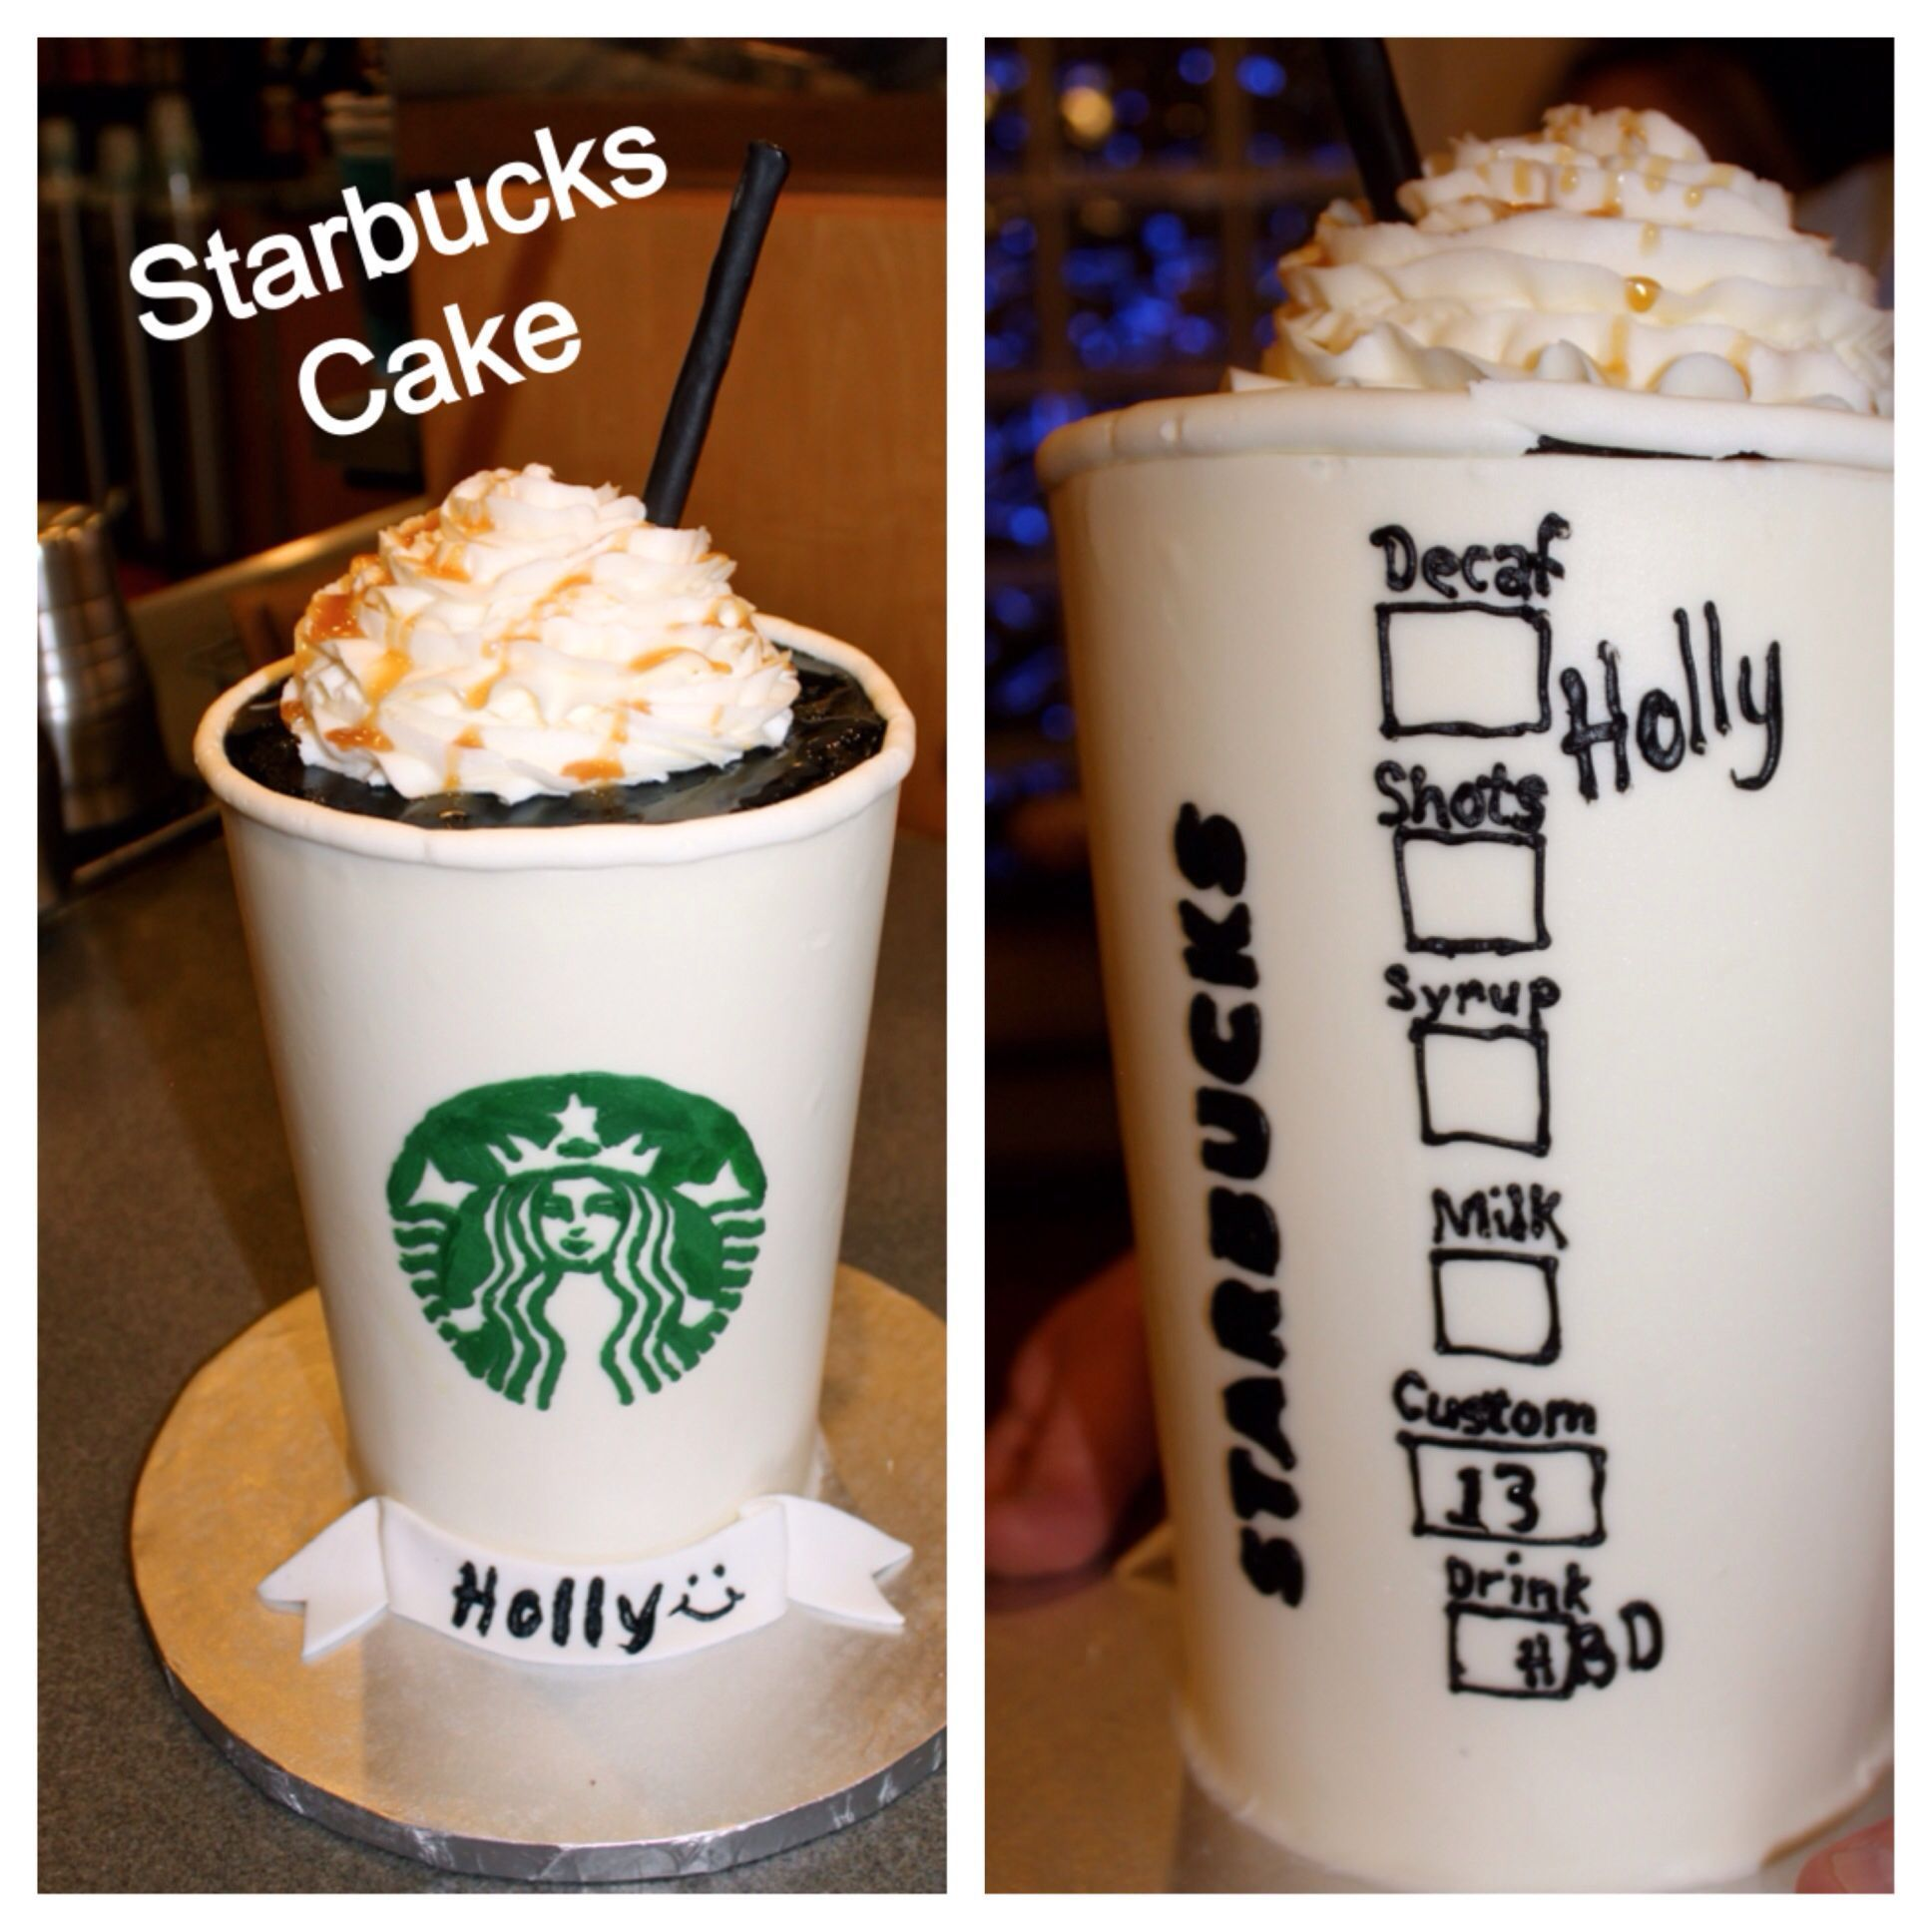 Starbucks Frappuccino birthday cake! #starbuckscake Starbucks Frappuccino birthday cake! #starbucksfrappuccino Starbucks Frappuccino birthday cake! #starbuckscake Starbucks Frappuccino birthday cake! #starbucksfrappuccino